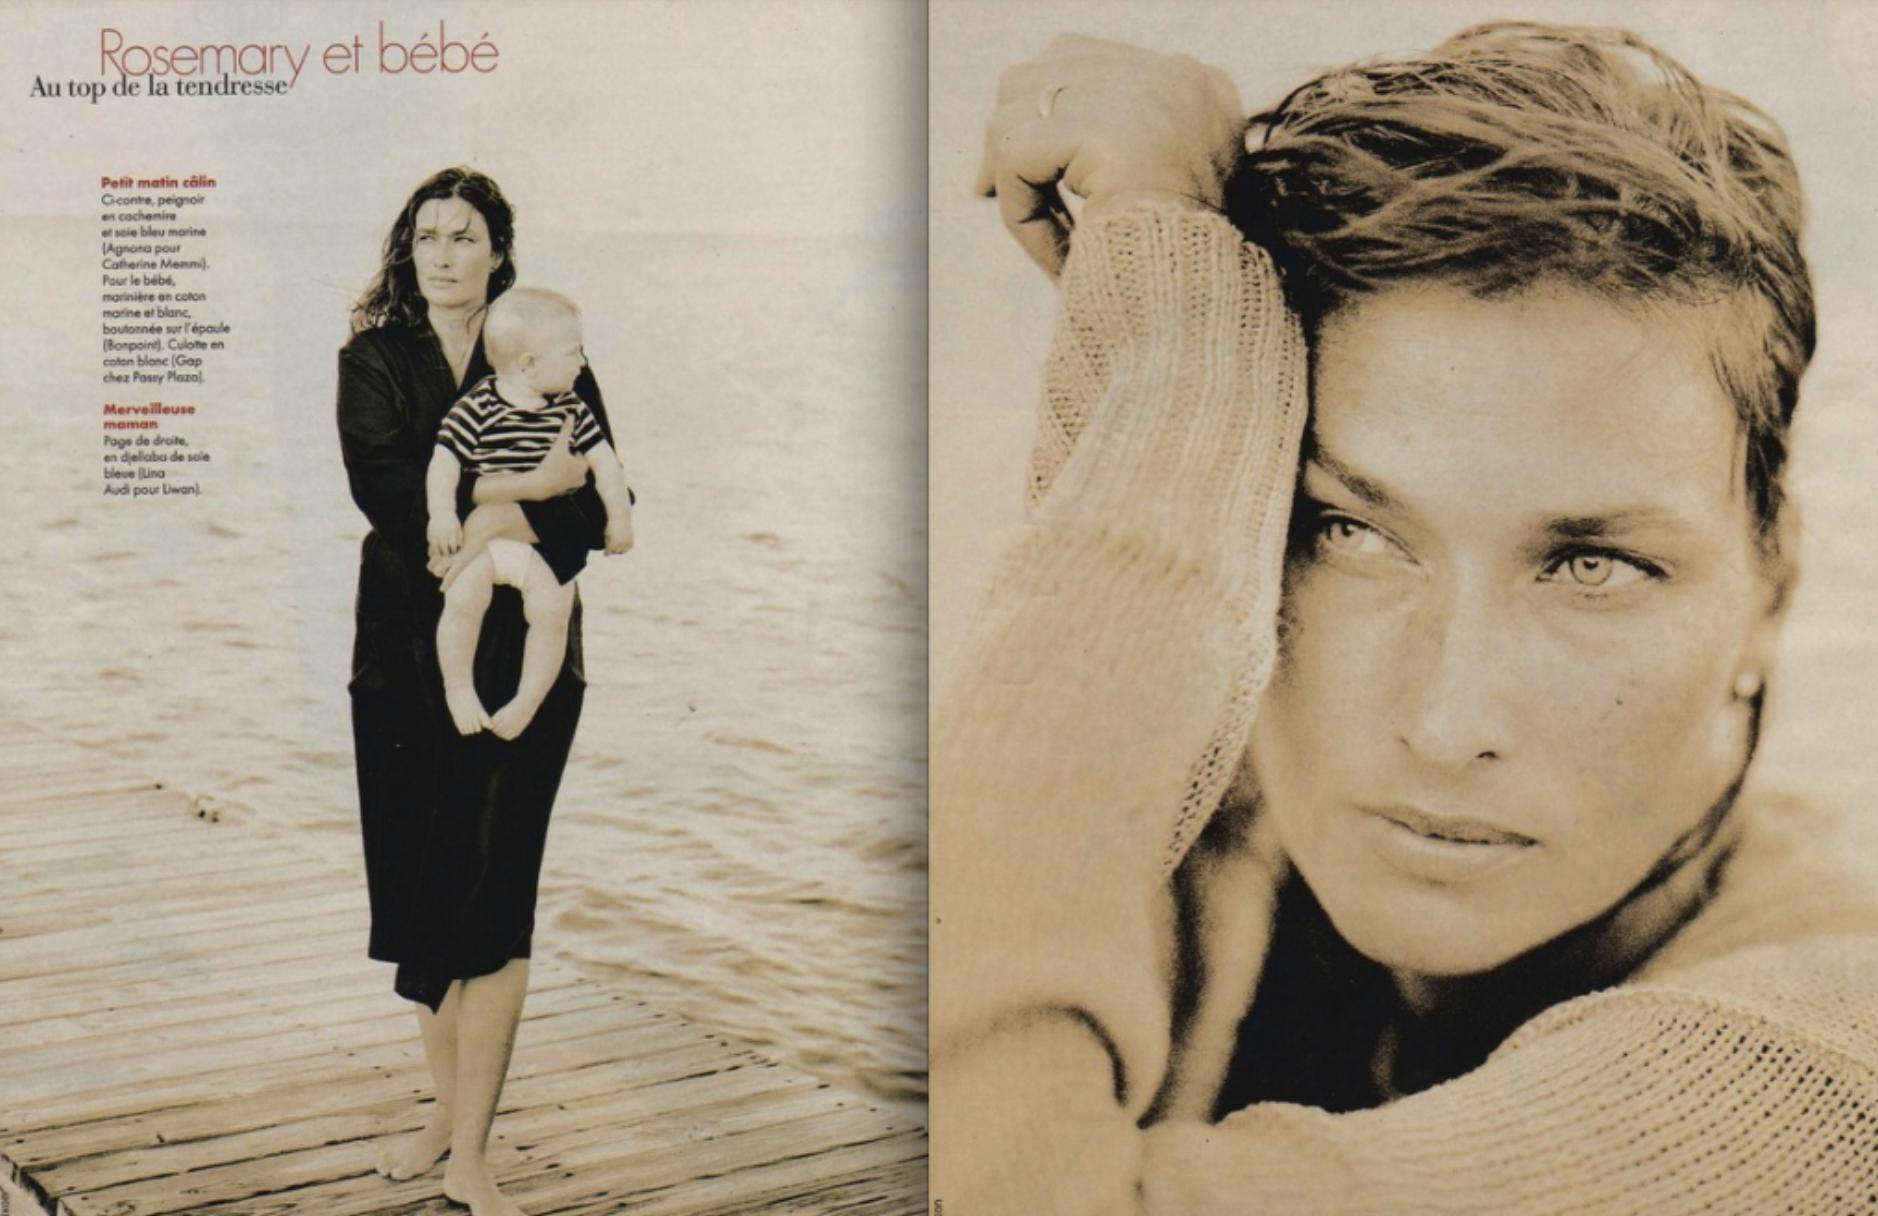 ROSEMARY McGROTHA ELLE FRANCE 1996 - PHOTO PHILLIP DIXION